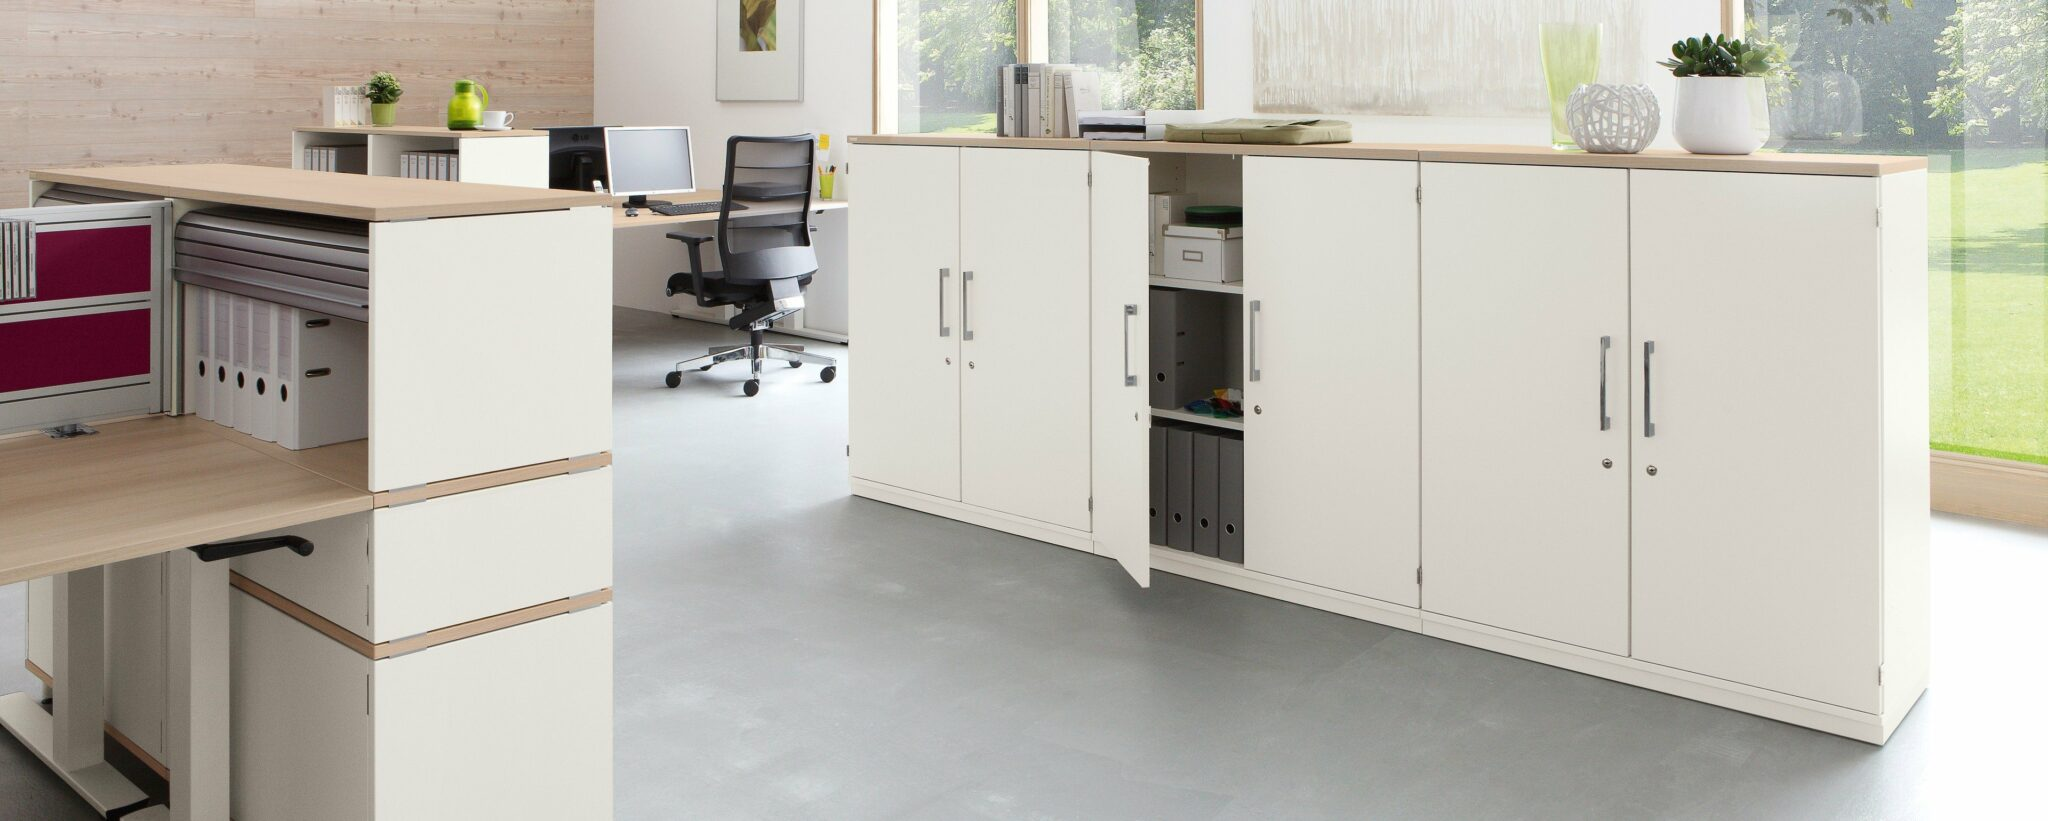 Palmberg kantoormeubilair Den Haag opbergruimte - kasten Heering Office